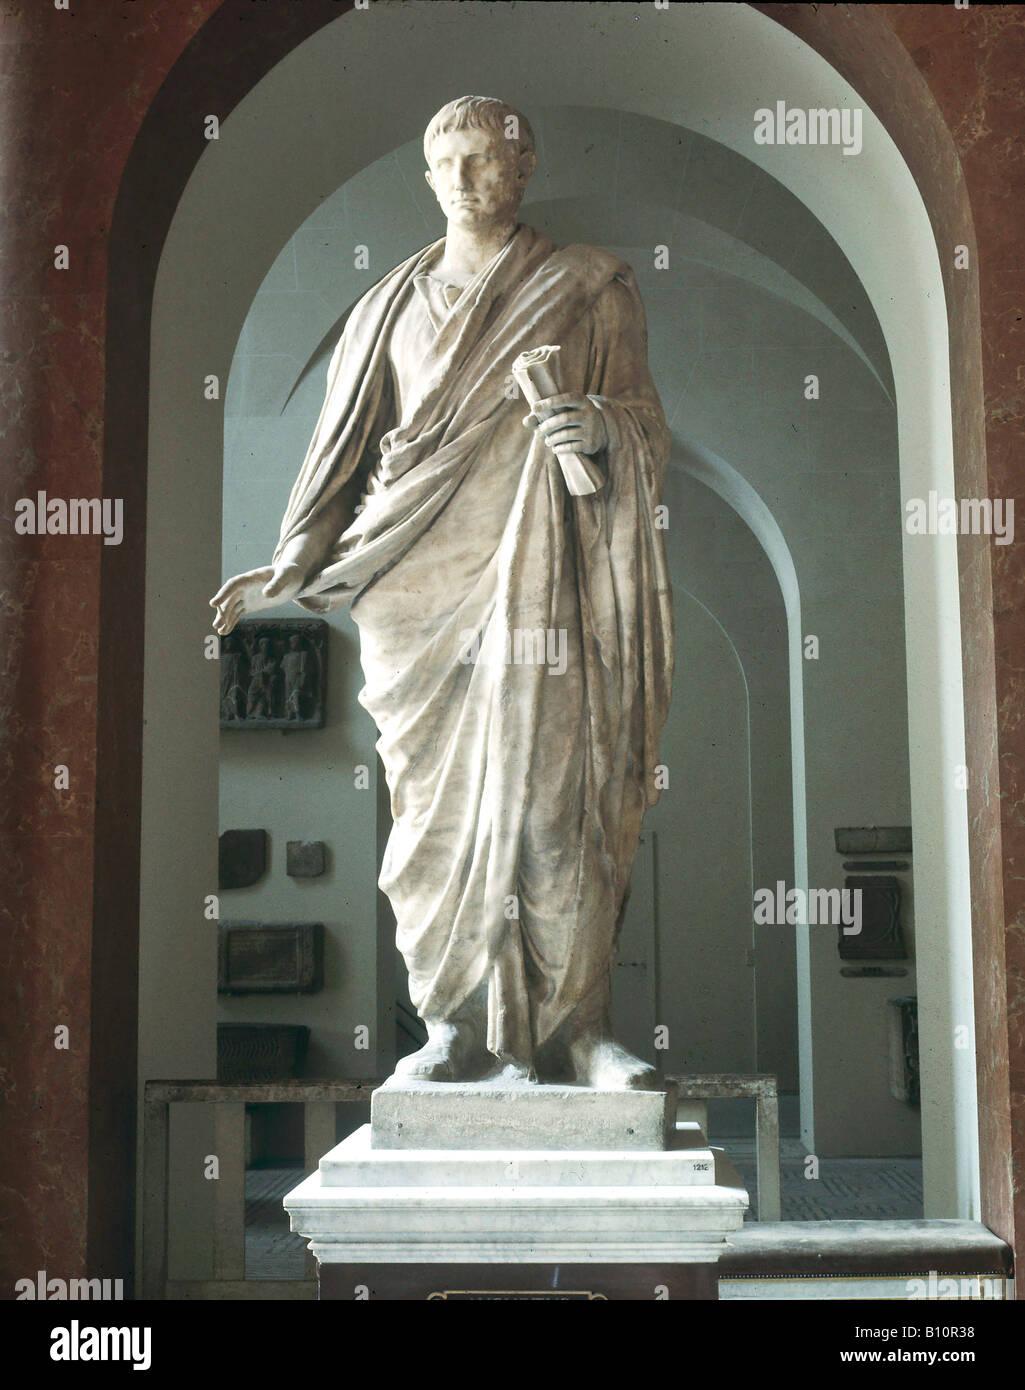 Augustus Roman emperor Statue Italy - Stock Image